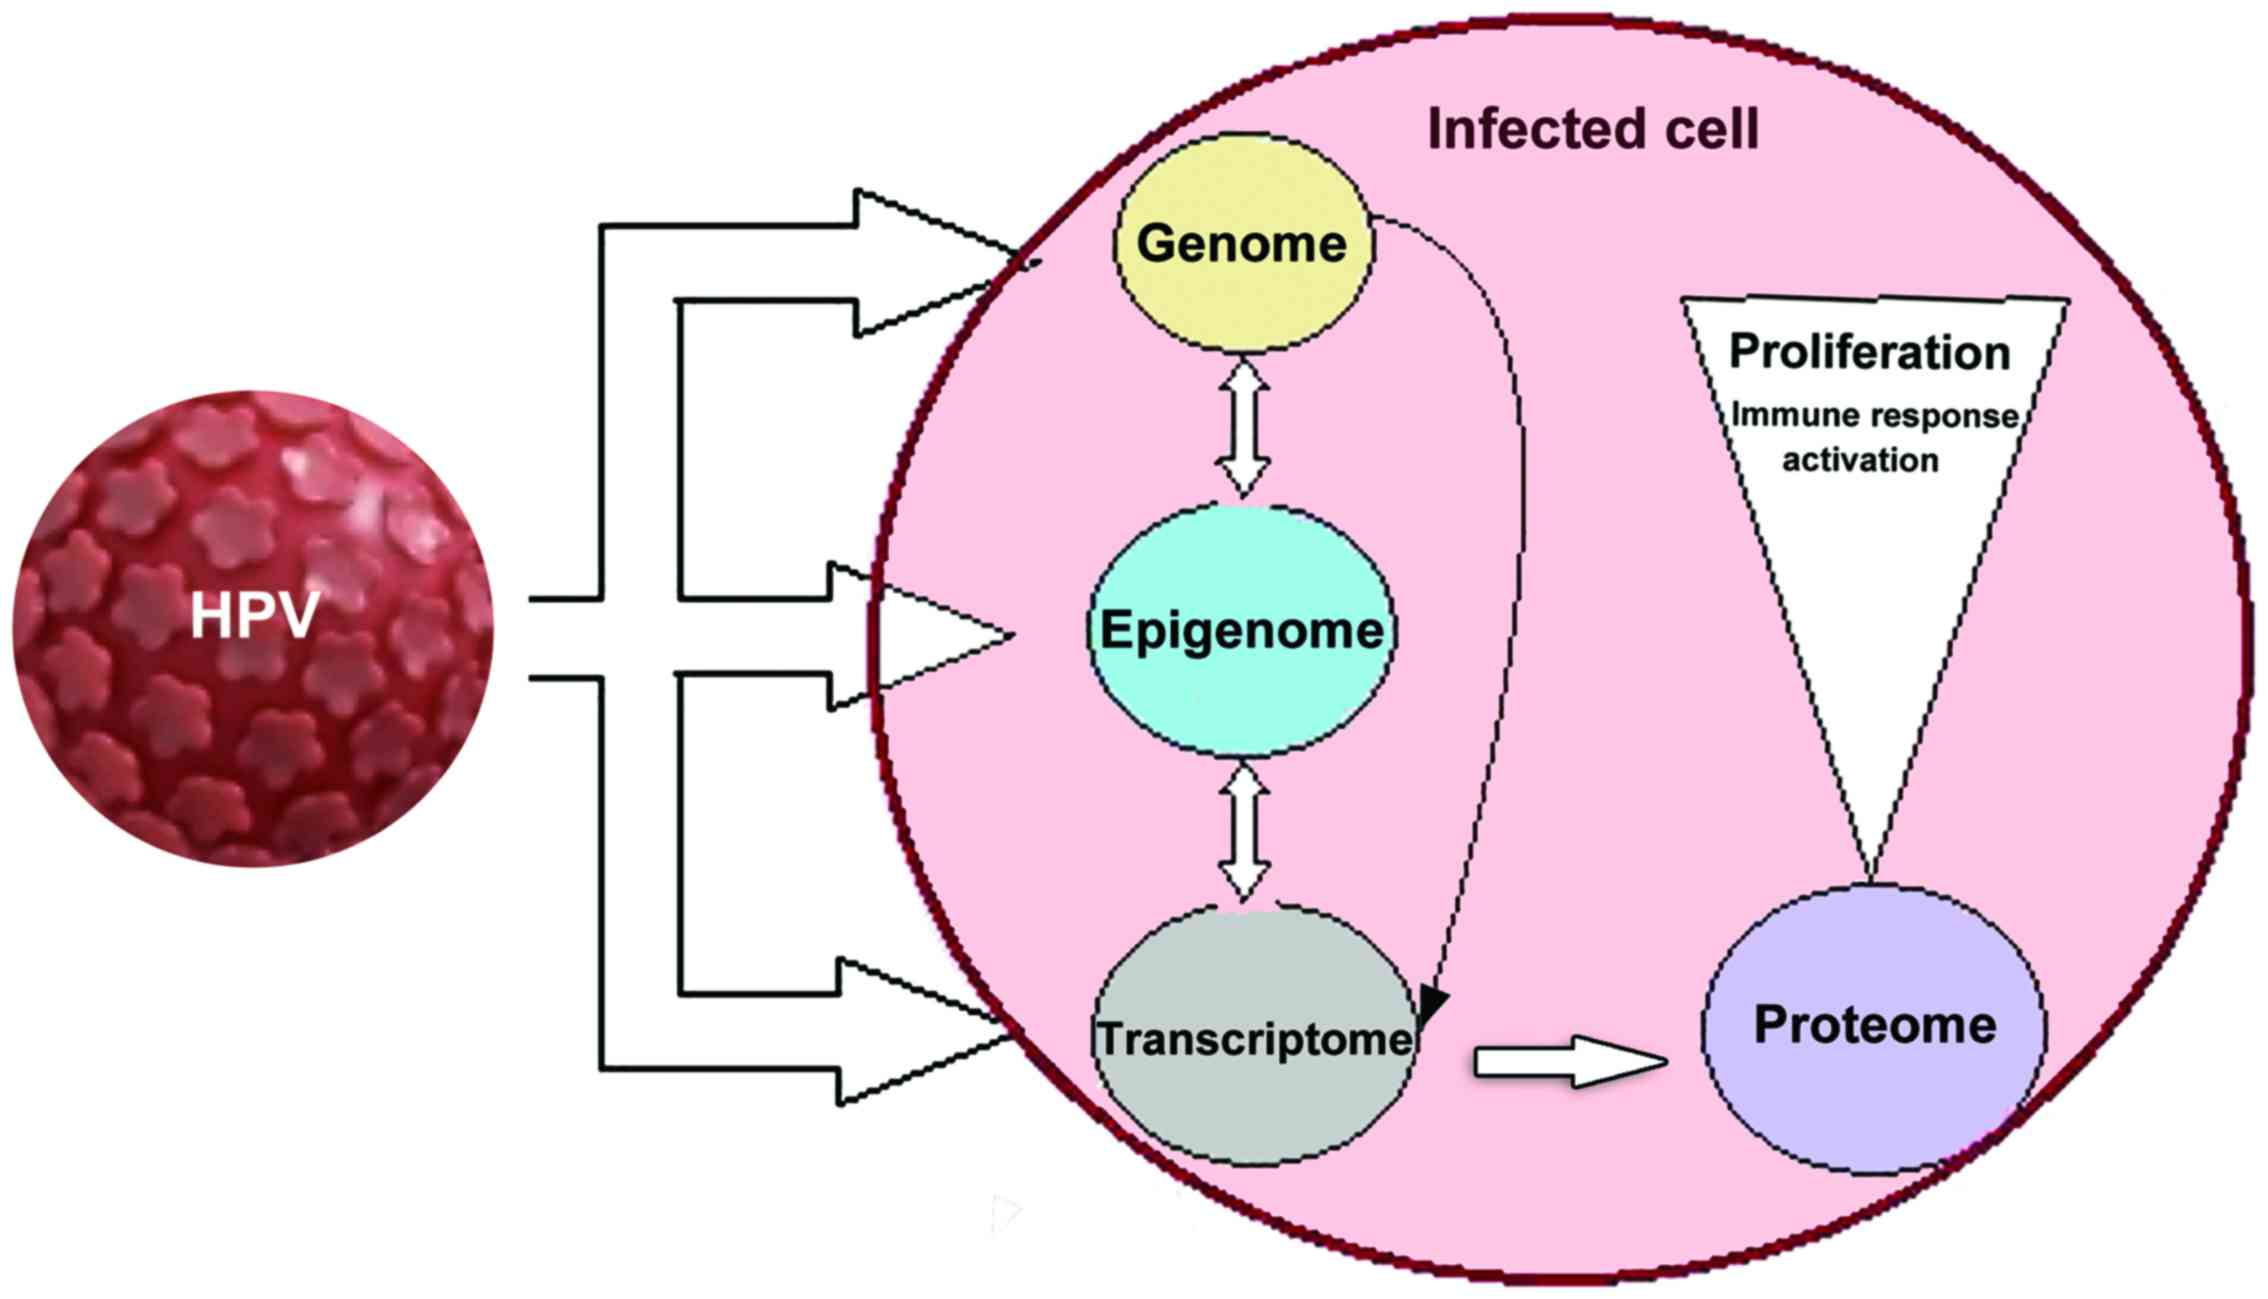 papillomavirus oncogene transmission)